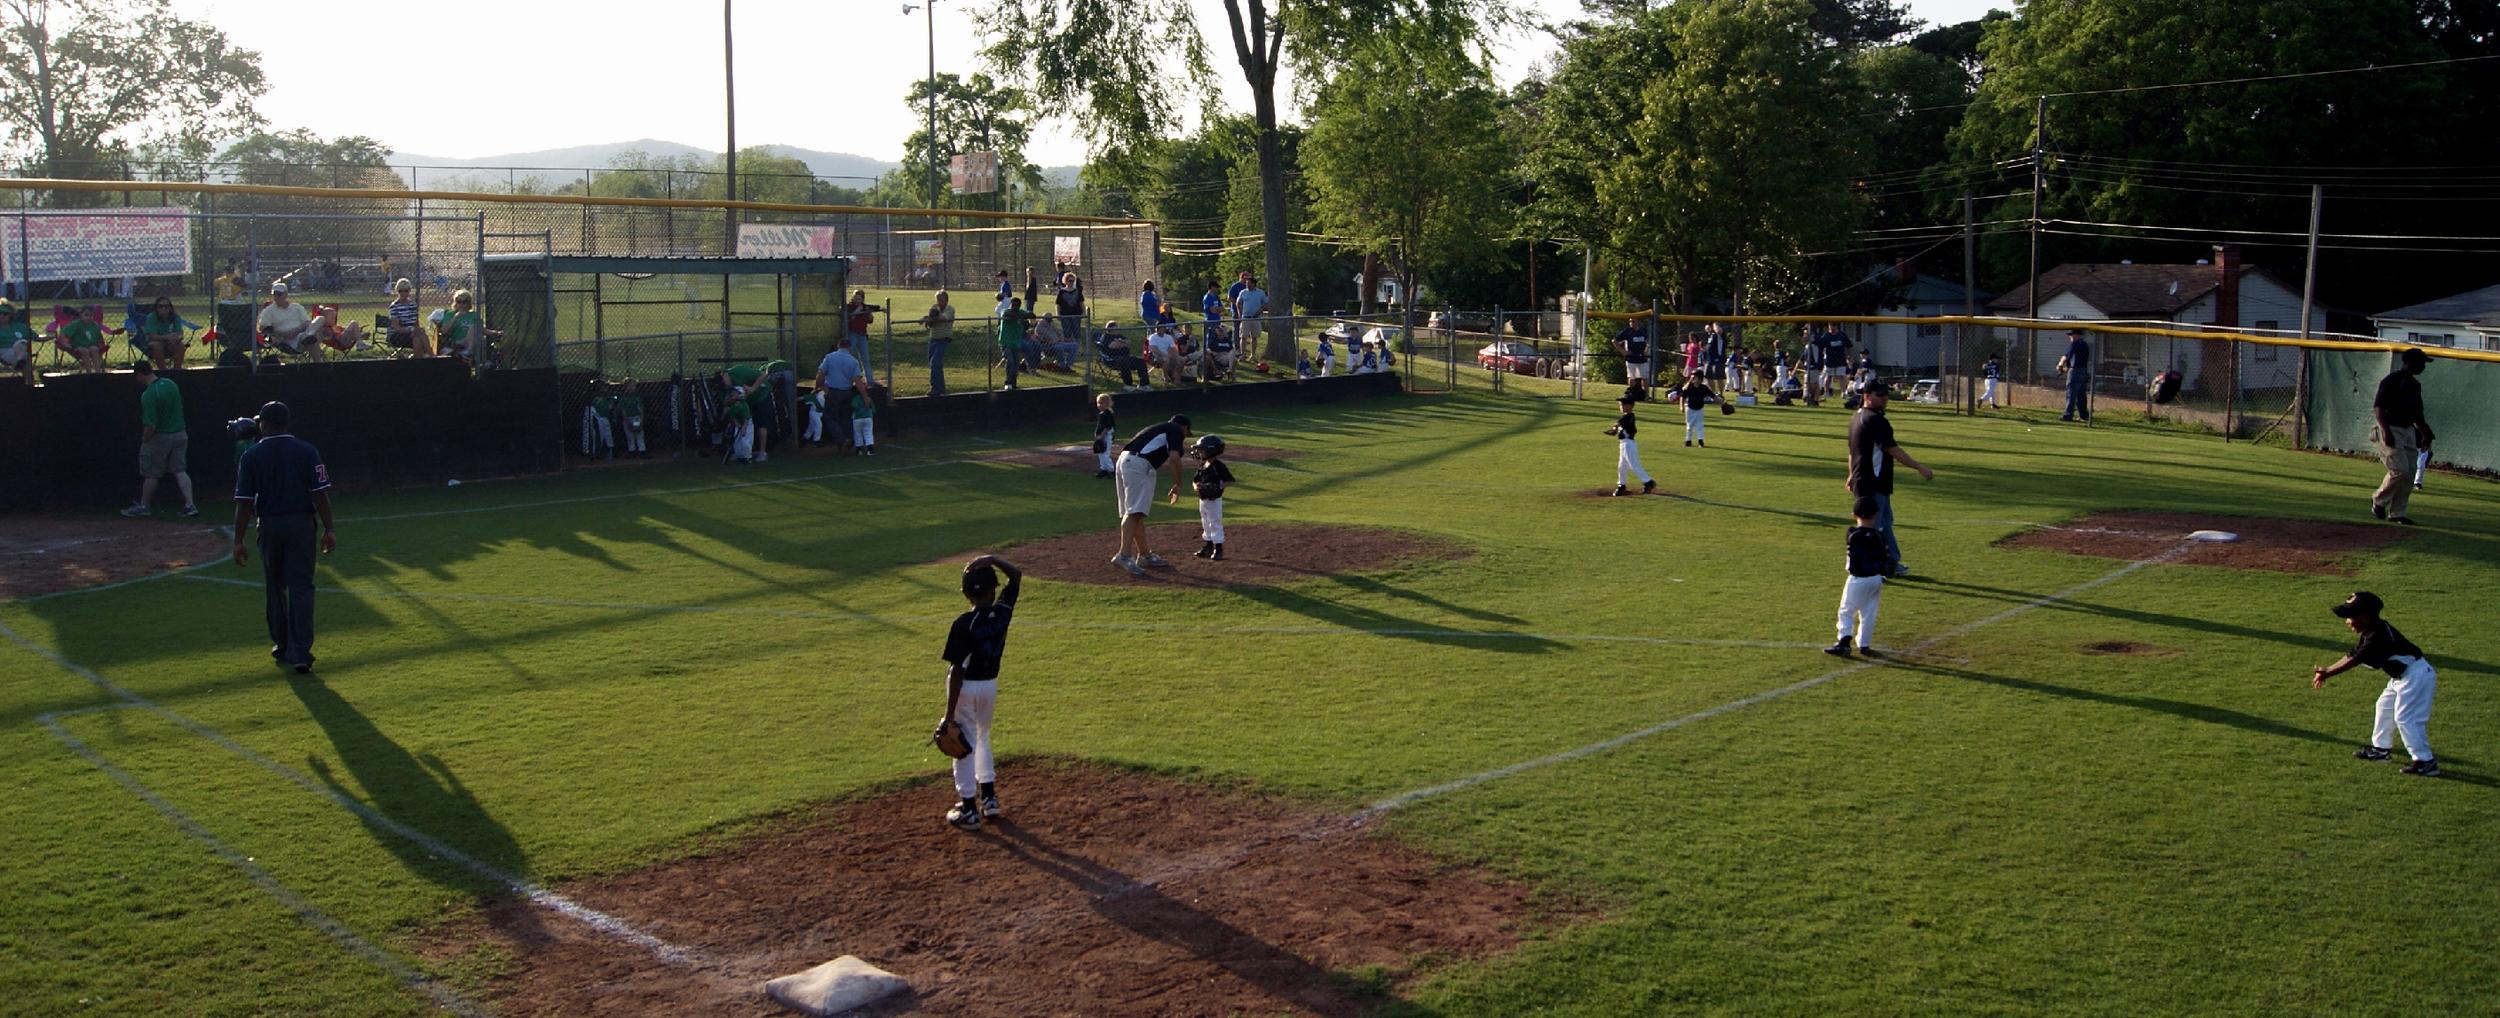 T-ball Game, Oxford Lake